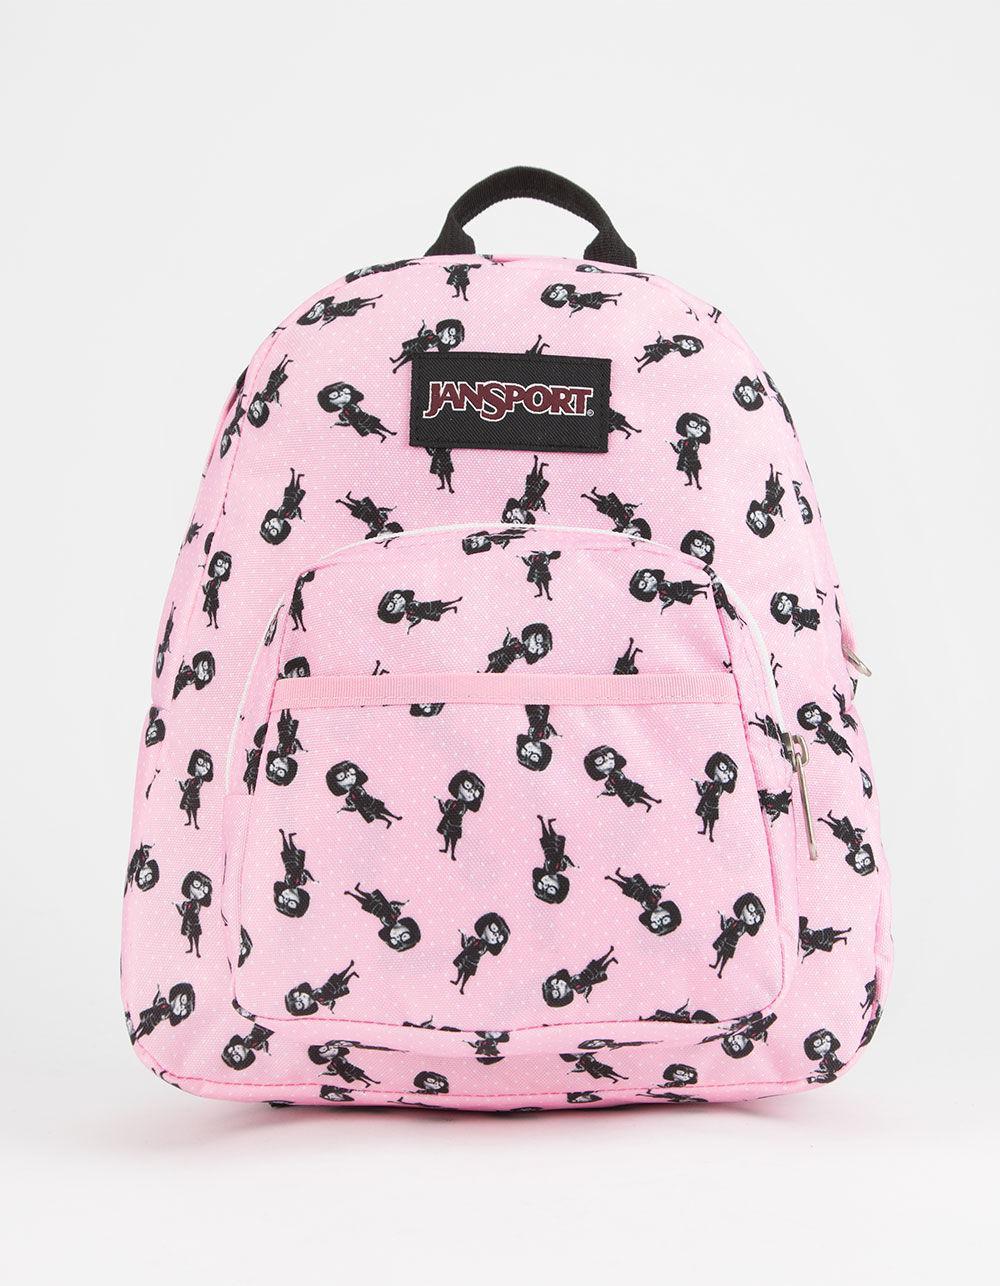 7d41282b977d Jansport Mini Backpack Disney- Fenix Toulouse Handball